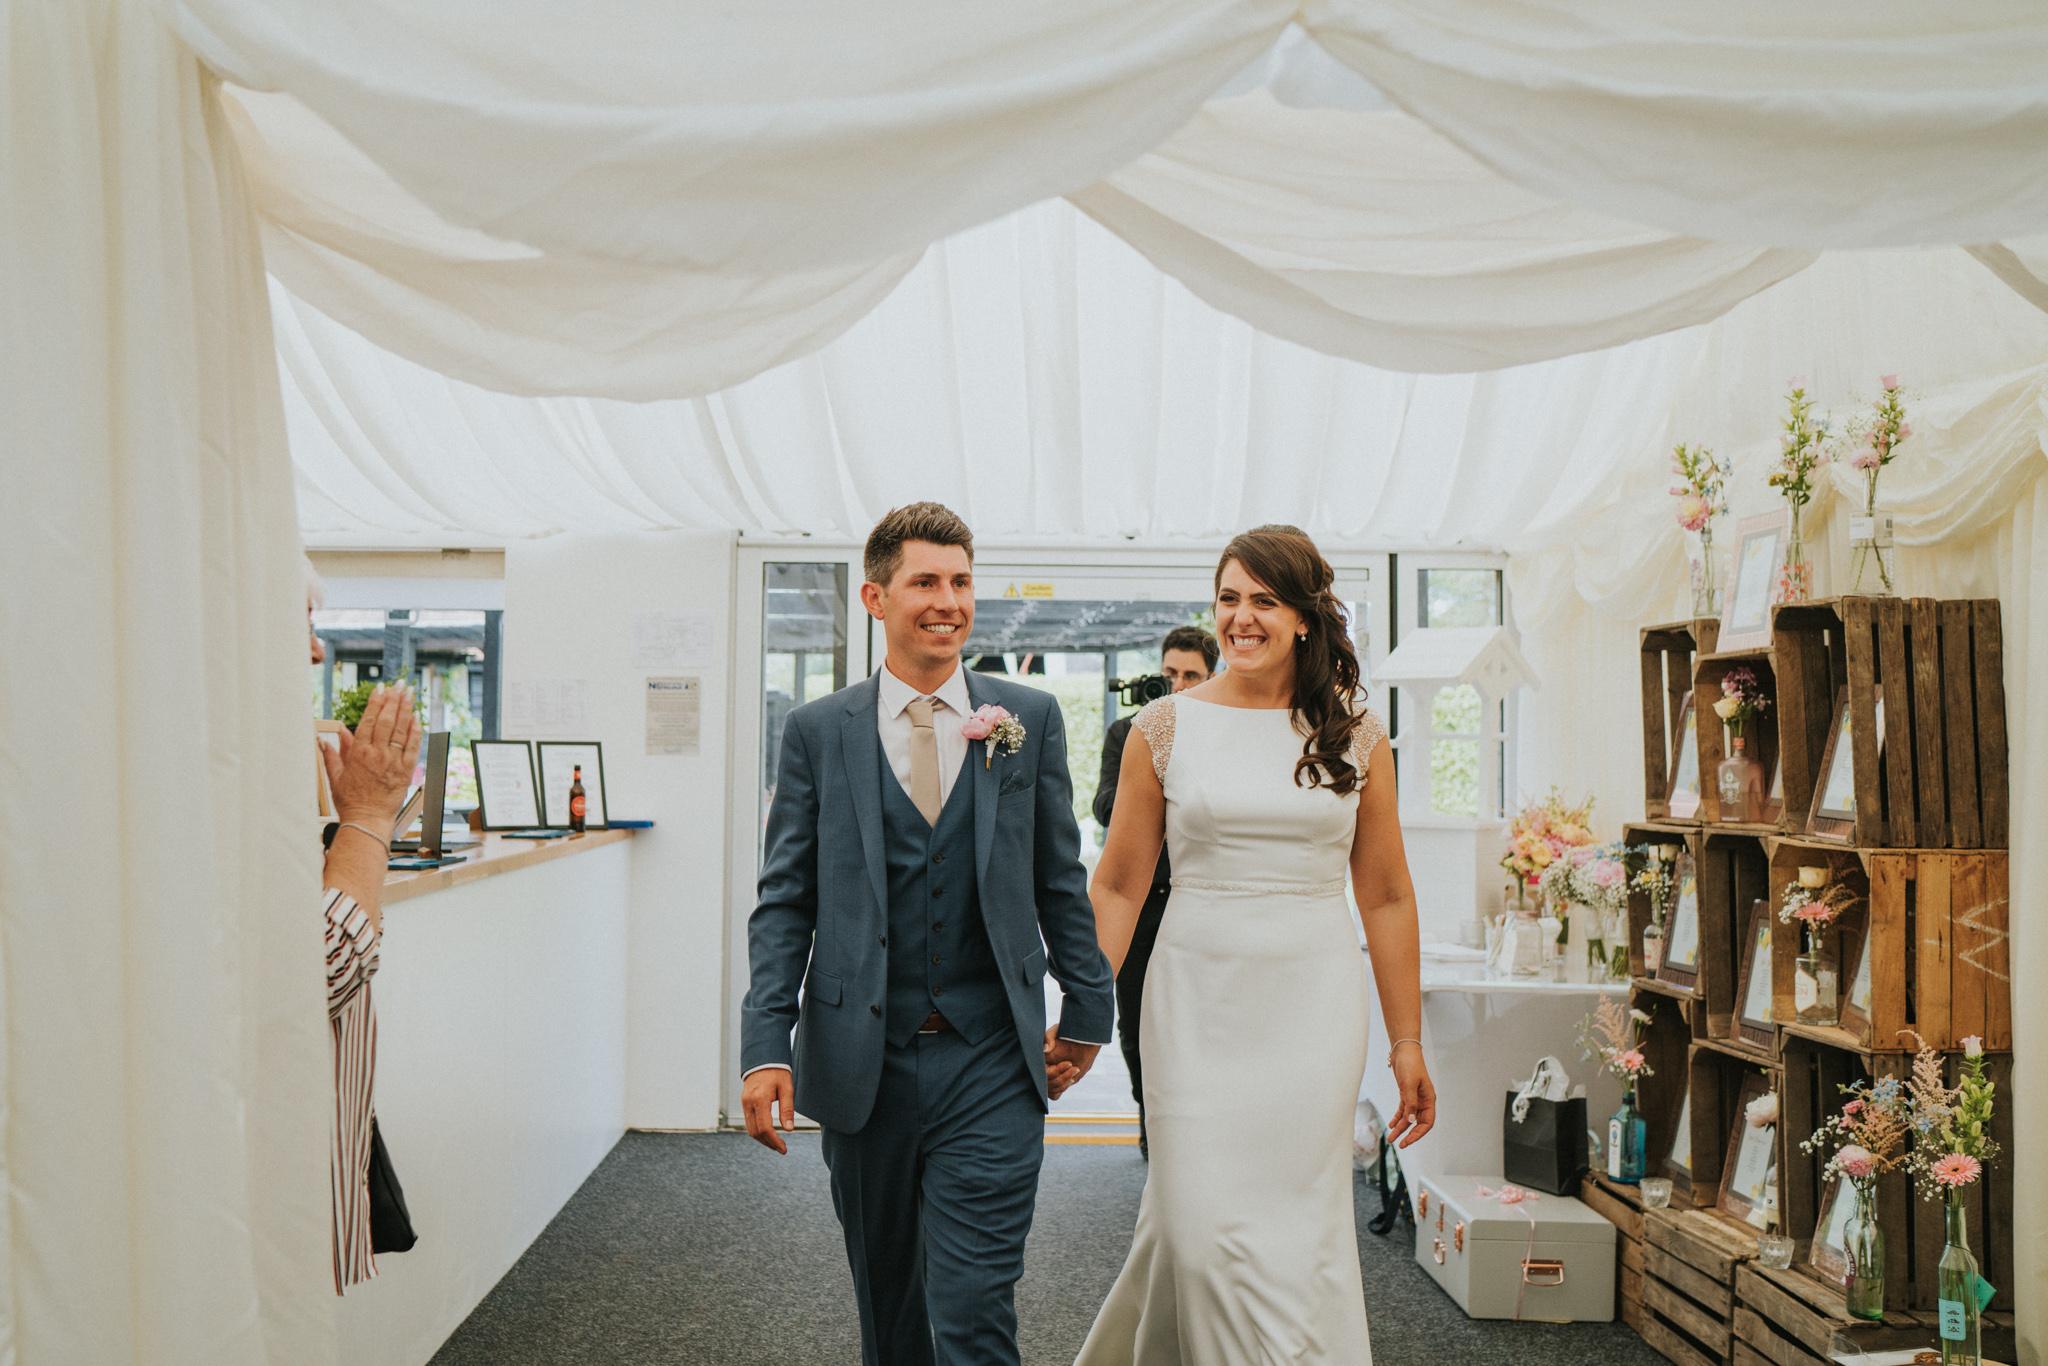 danielle-and-gareths-boho-wedding-previews-at-high-house-weddings-grace-elizabeth-colchester-essex-suffolk-norfolk-devon-alternative-wedding-and-lifestyle-photographer (54 of 76).jpg